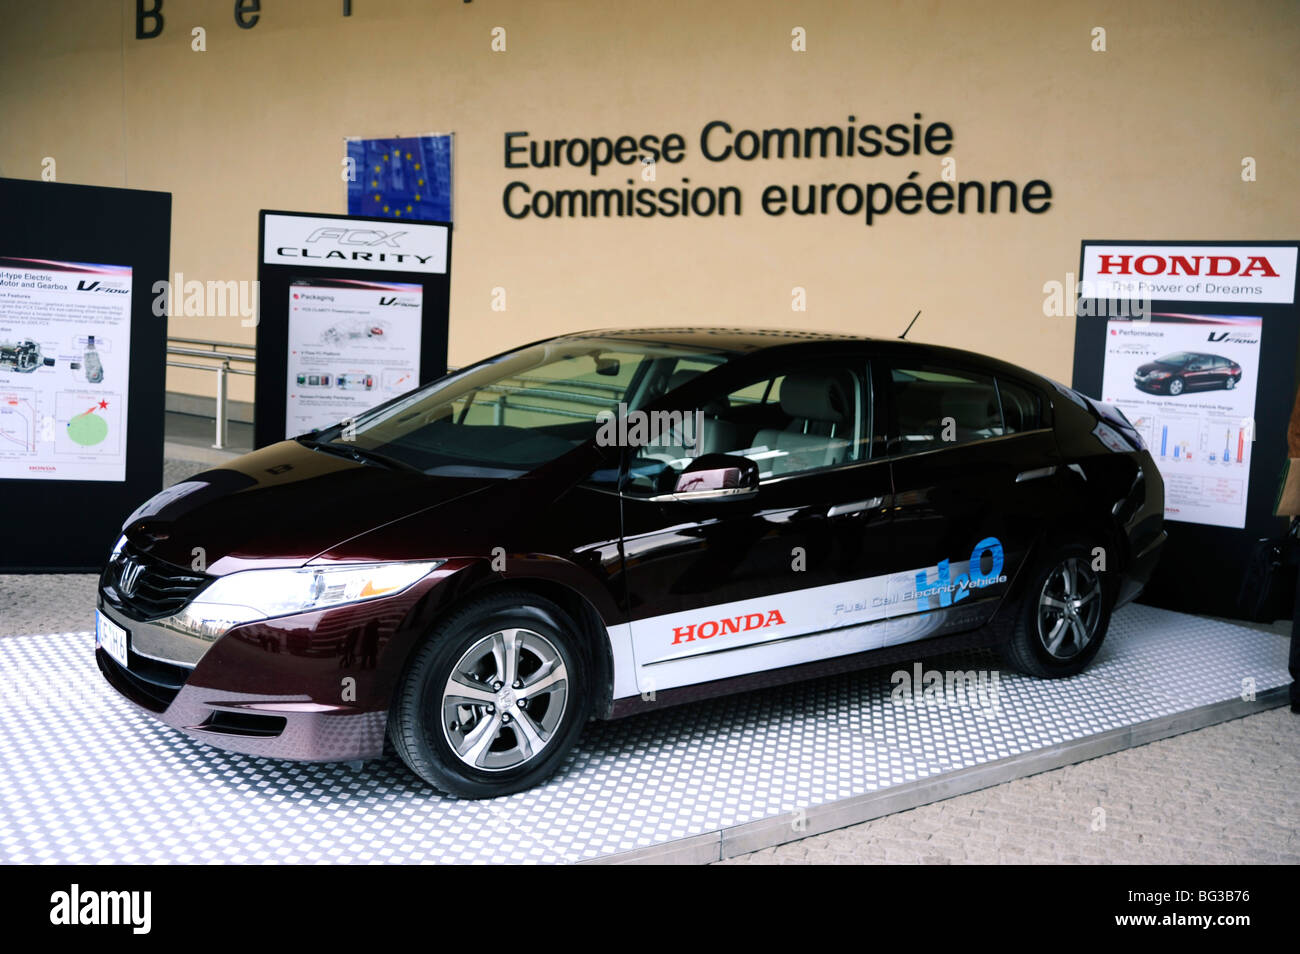 Honda FCX Clarity, Fuel Cell Vehicle,Hydrogen Motor, Zero Emission, Electric  Car